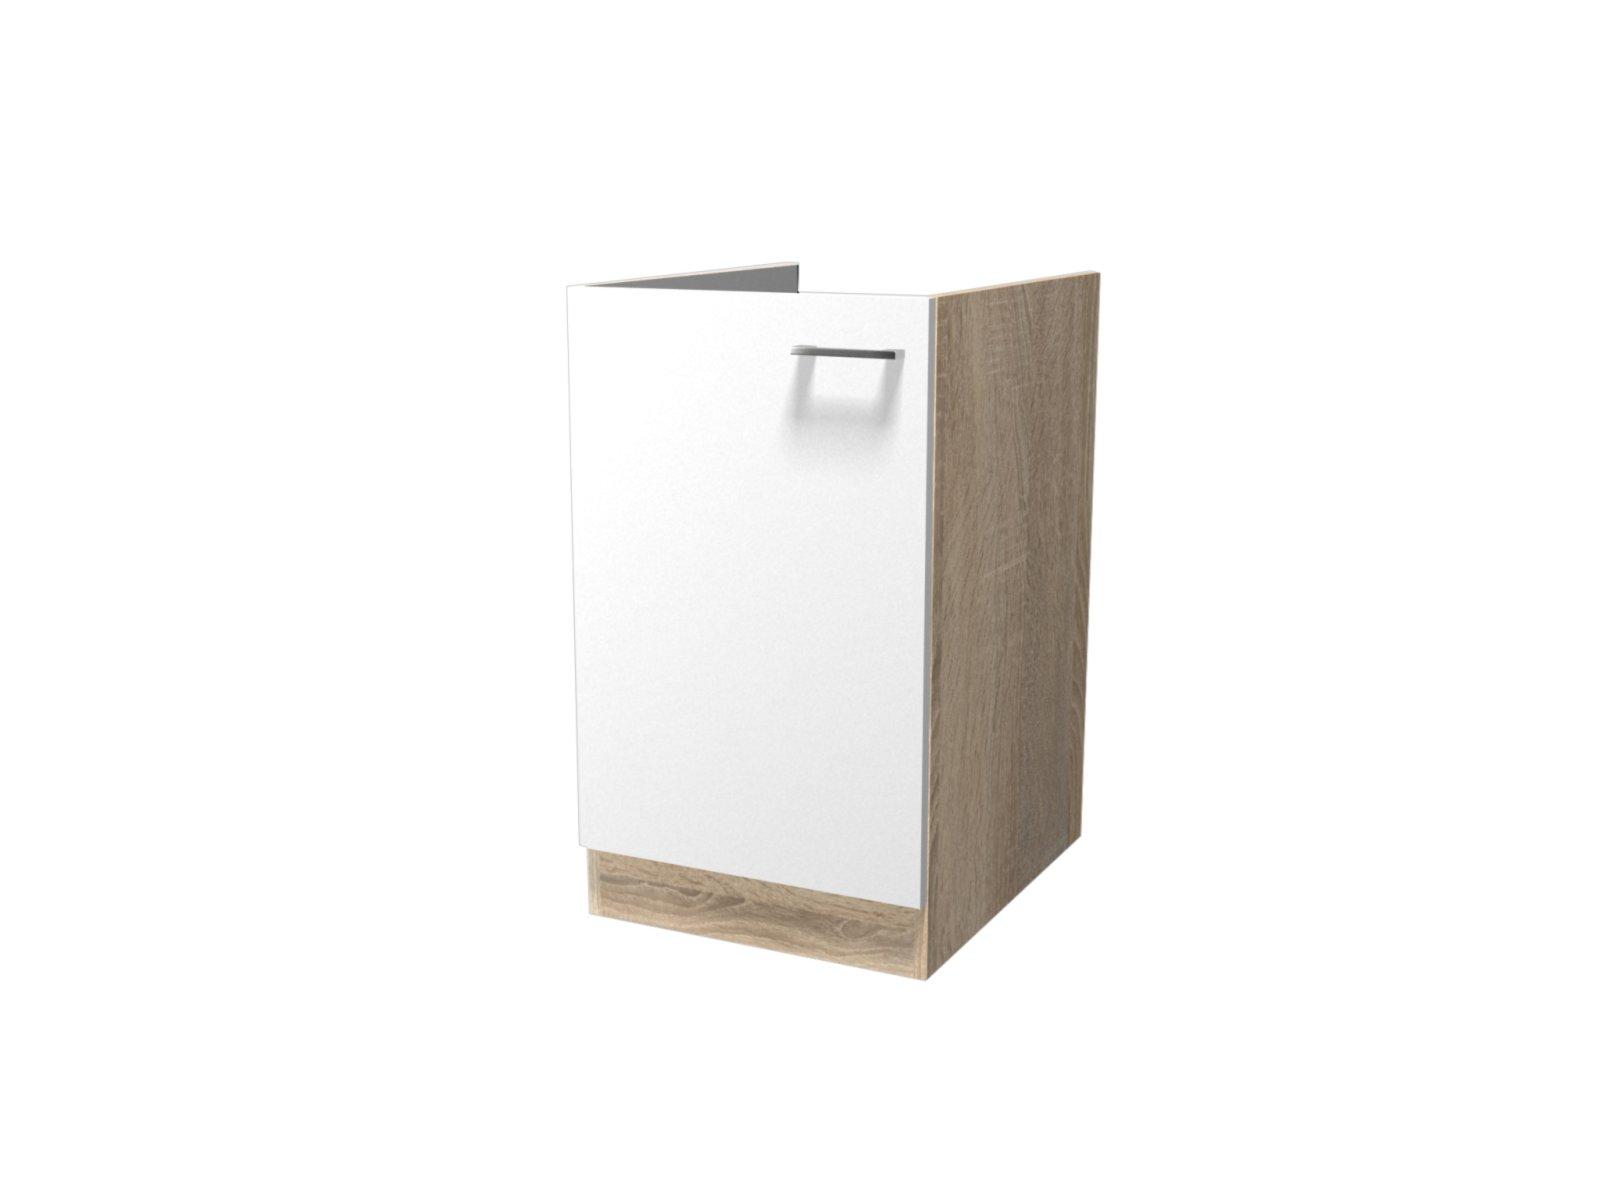 sp lenunterschrank samoa wei sonoma eiche 50 cm sp lenunterschr nke einzelschr nke. Black Bedroom Furniture Sets. Home Design Ideas